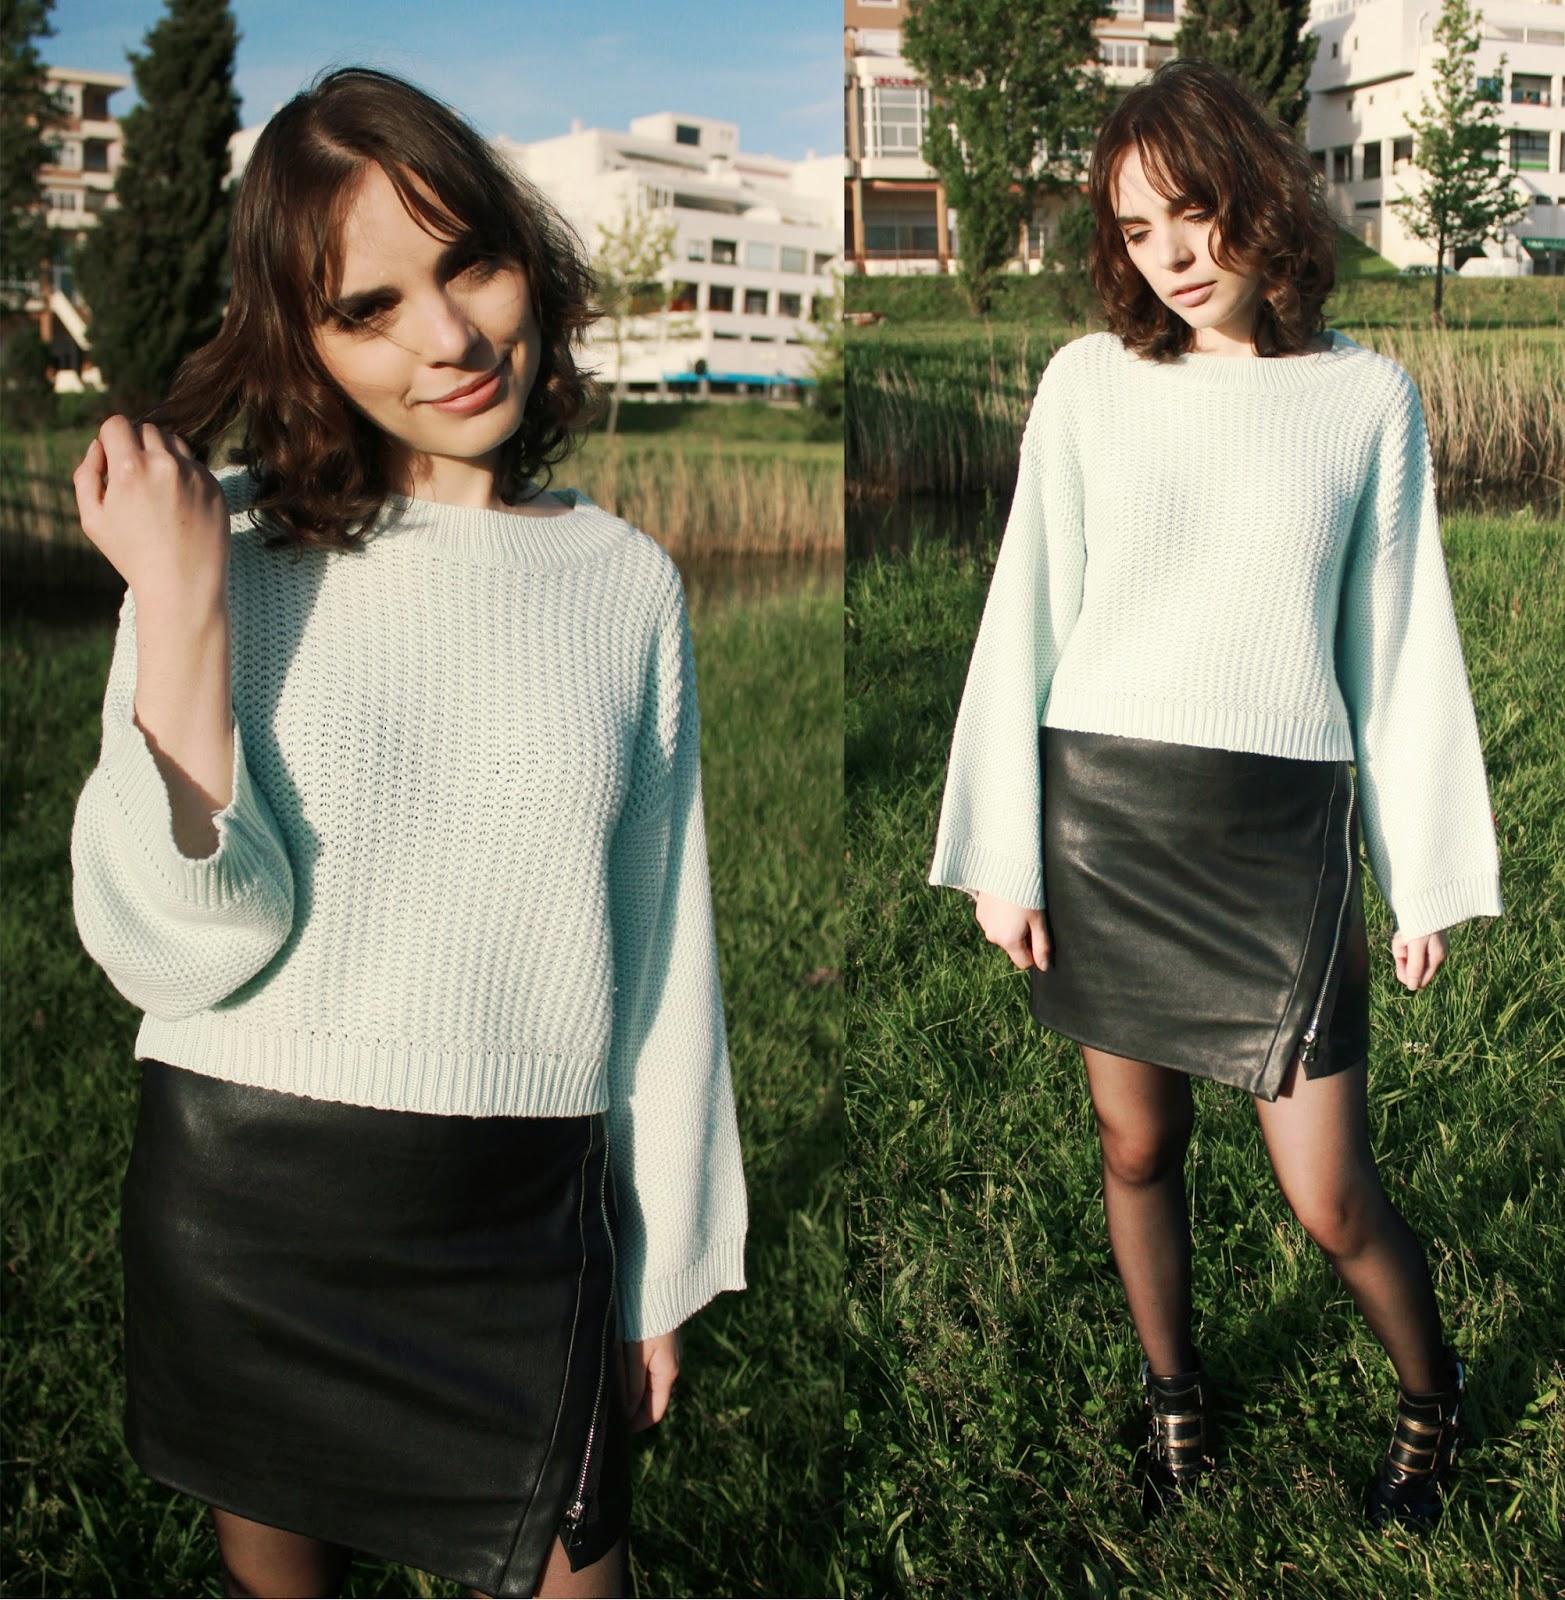 Zara Sock Fabric Shoes Review